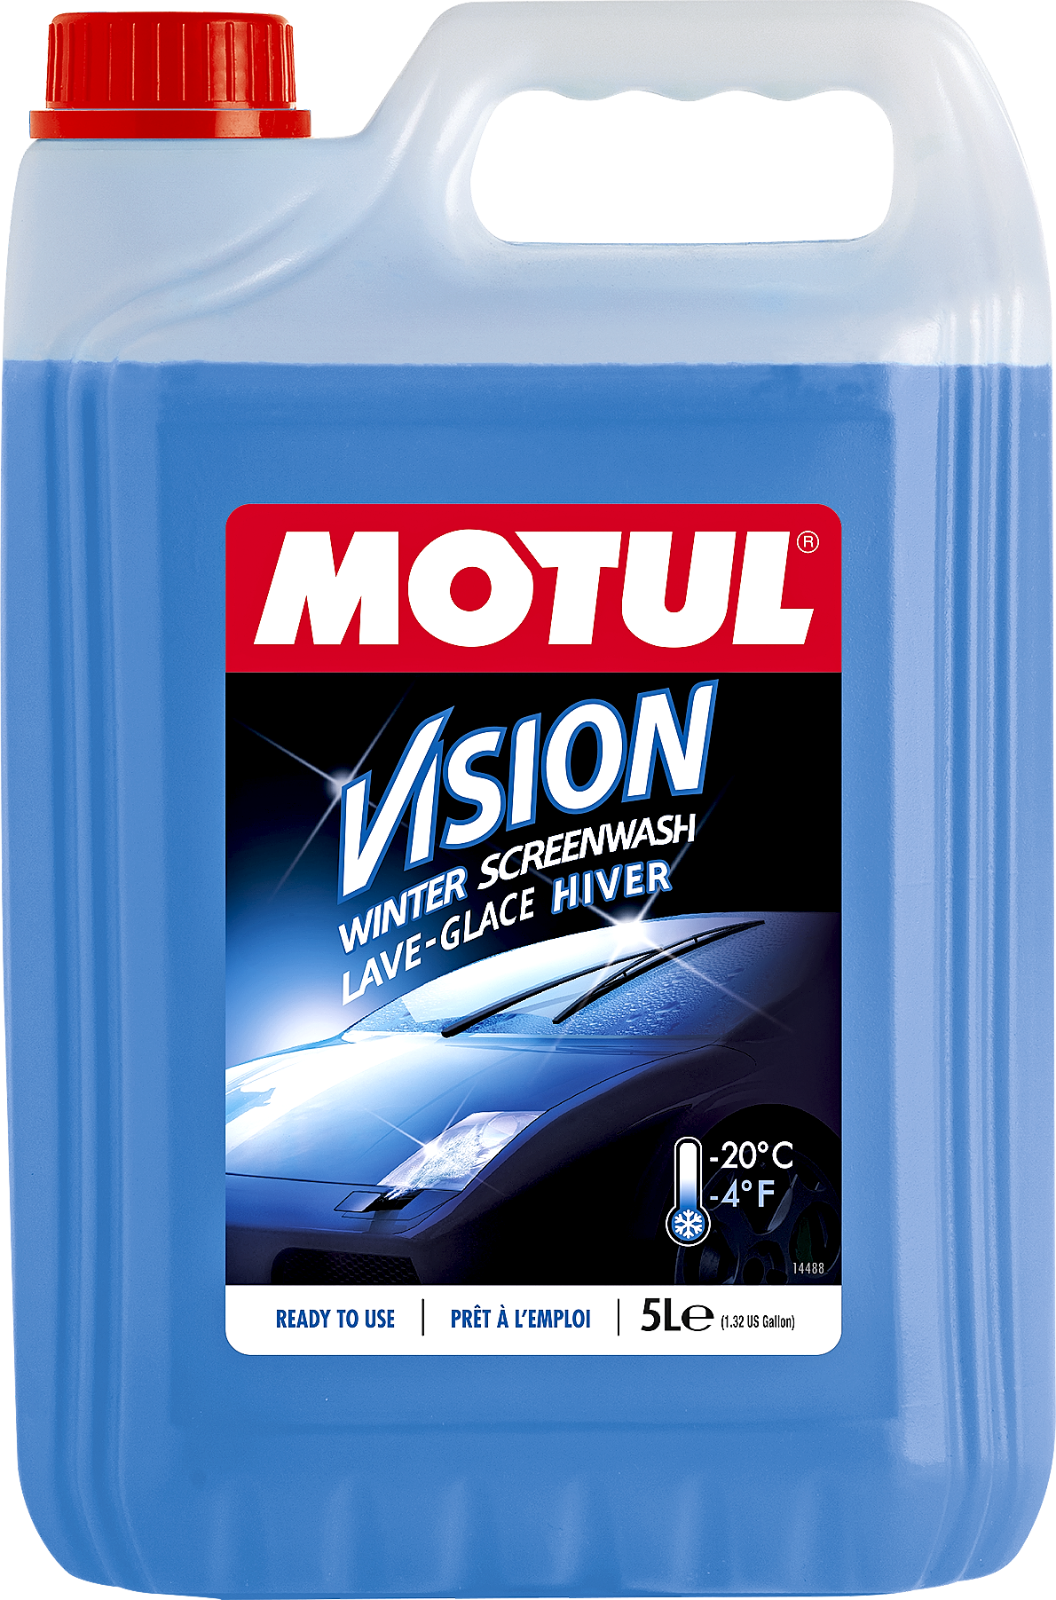 Motul Vision Cl.Winter -20 5L Készre kevert, -20C-ig